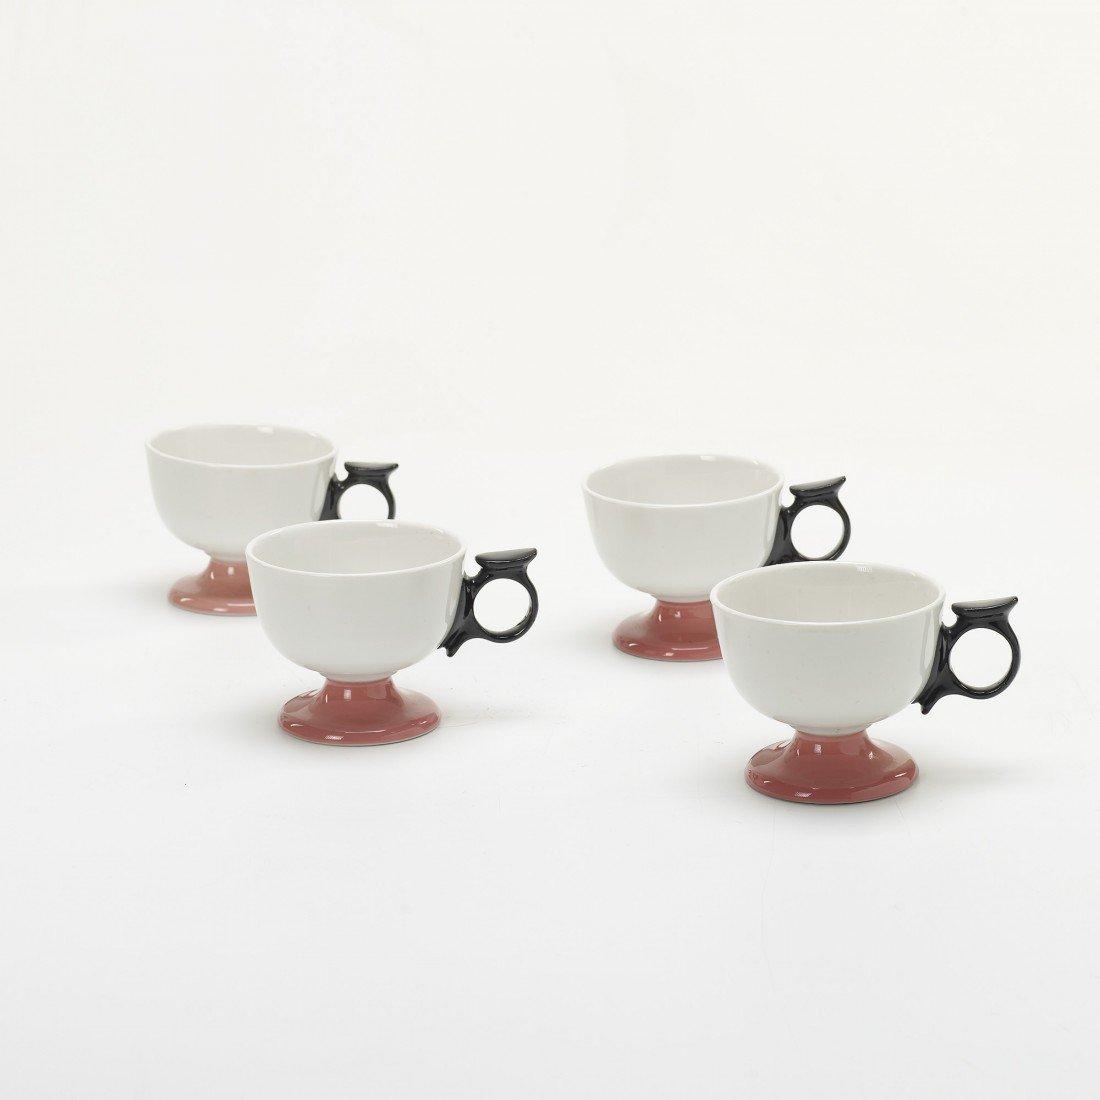 237: Alexander Girard La Fonda del Sol mugs, set of fou